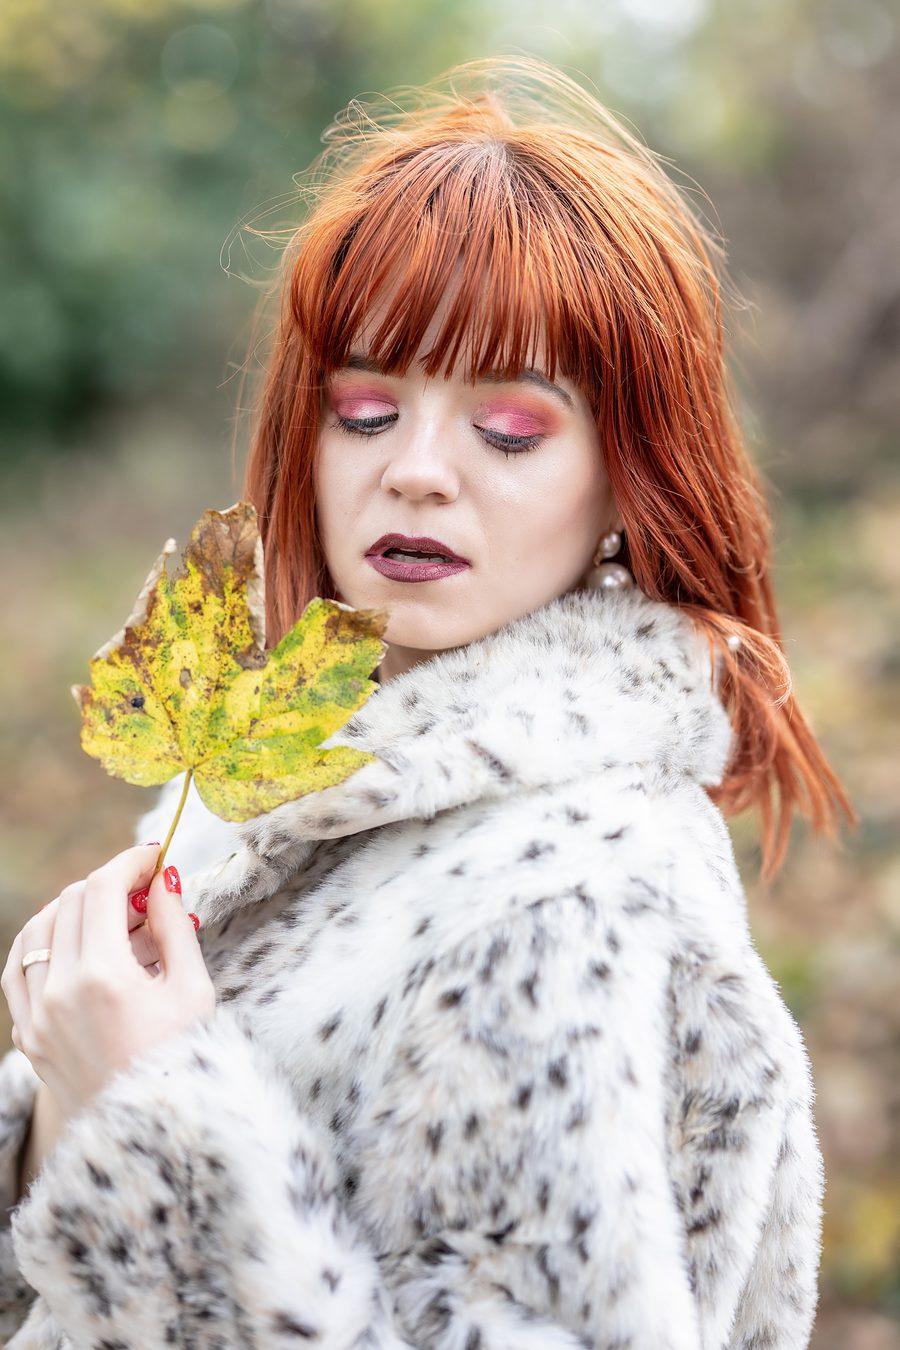 autumnal vibes